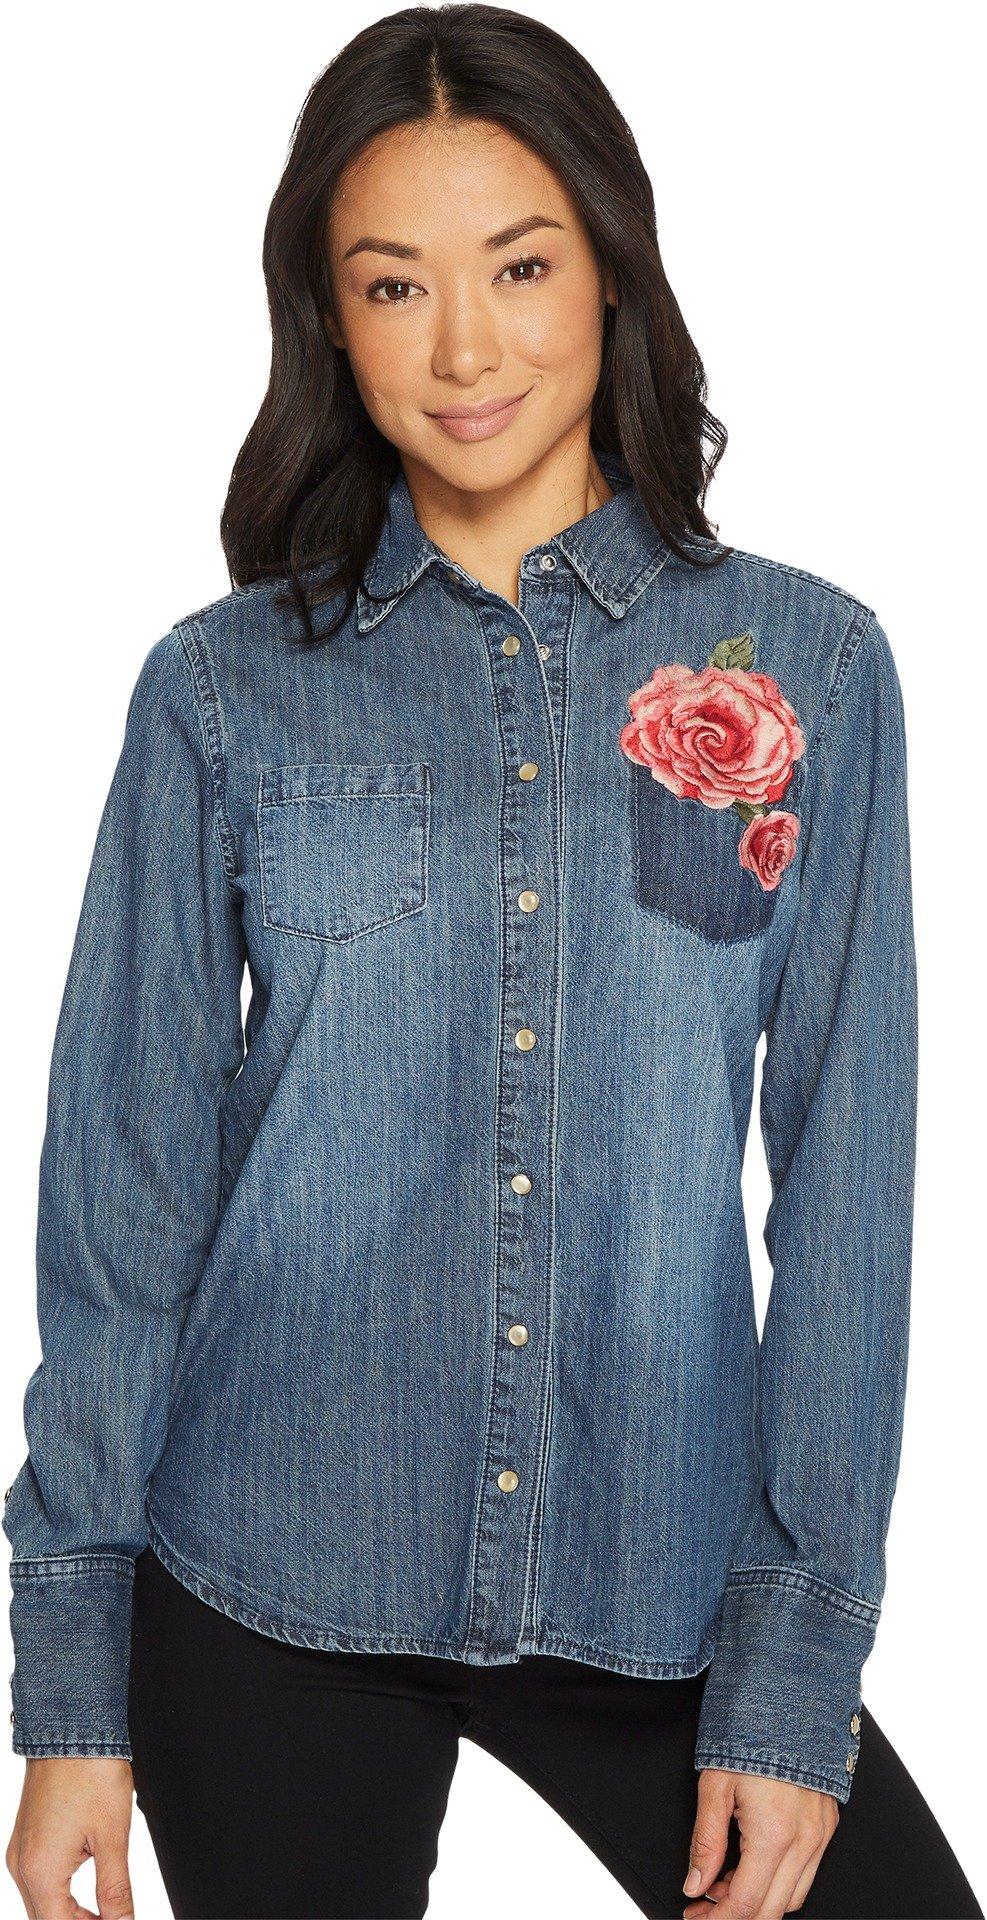 Stetson Women's Boyfriend Fit Western Shirt 60z Blue Medium